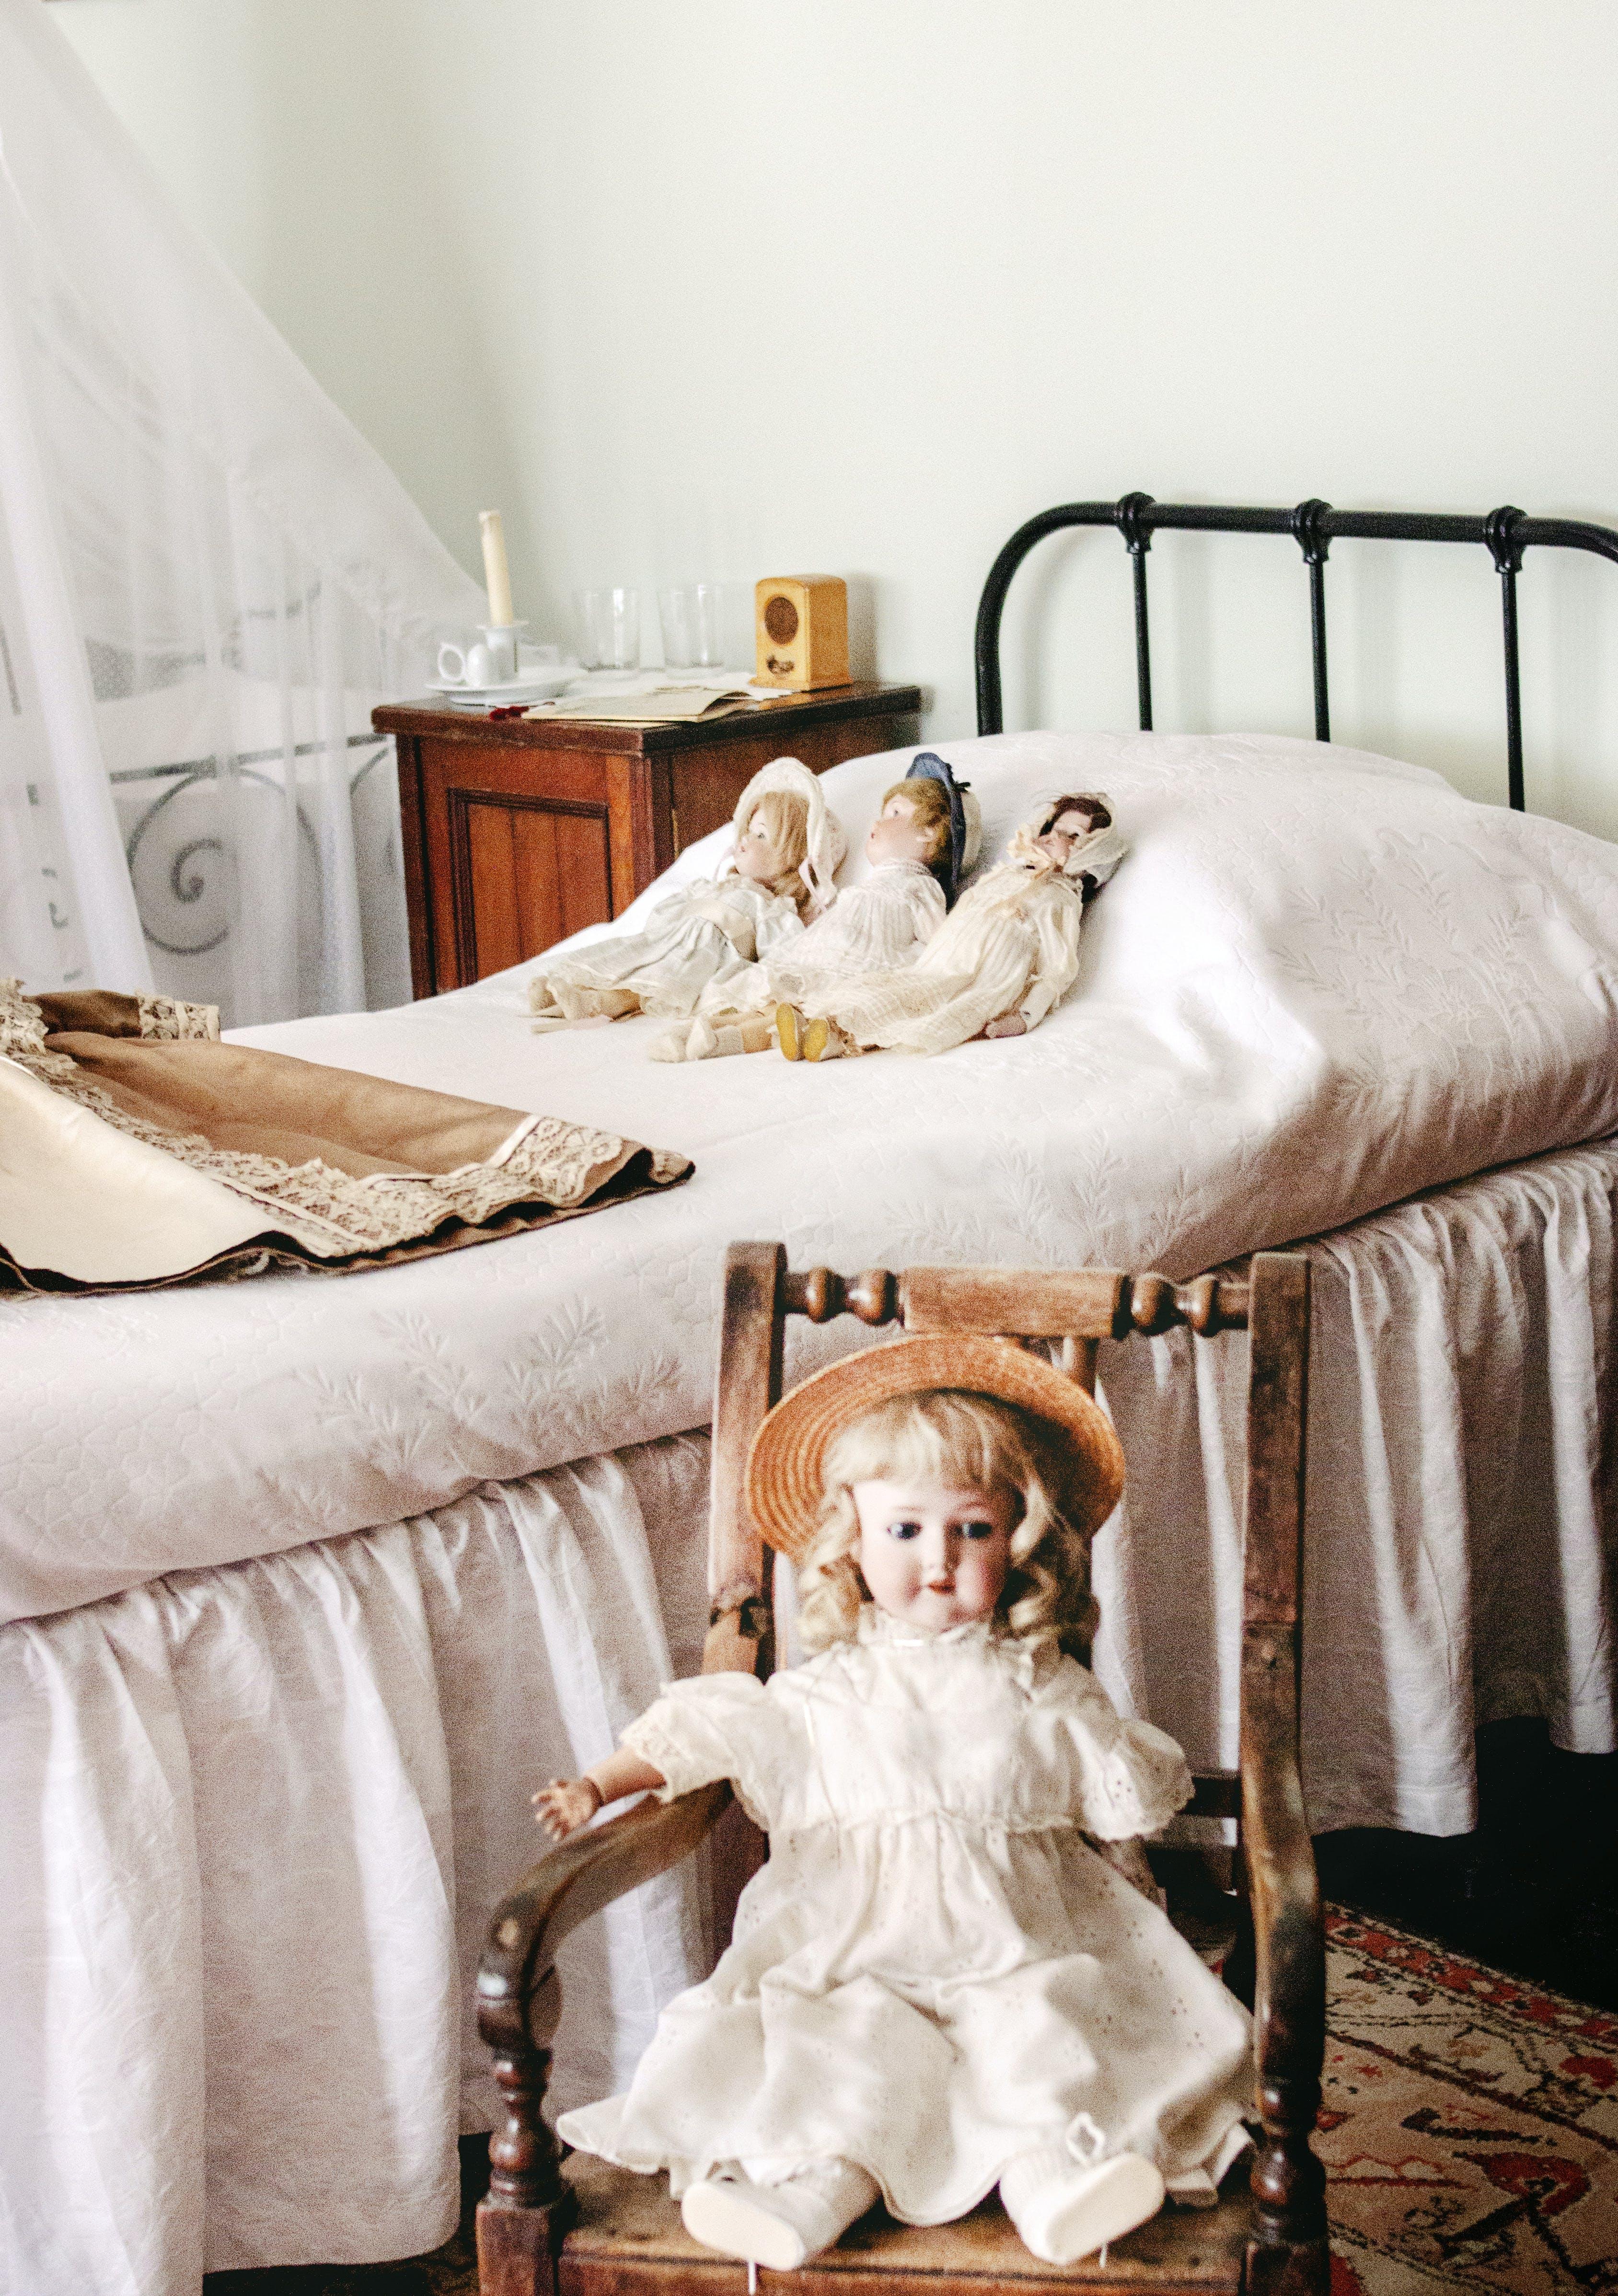 Three Dolls Lying on Bed